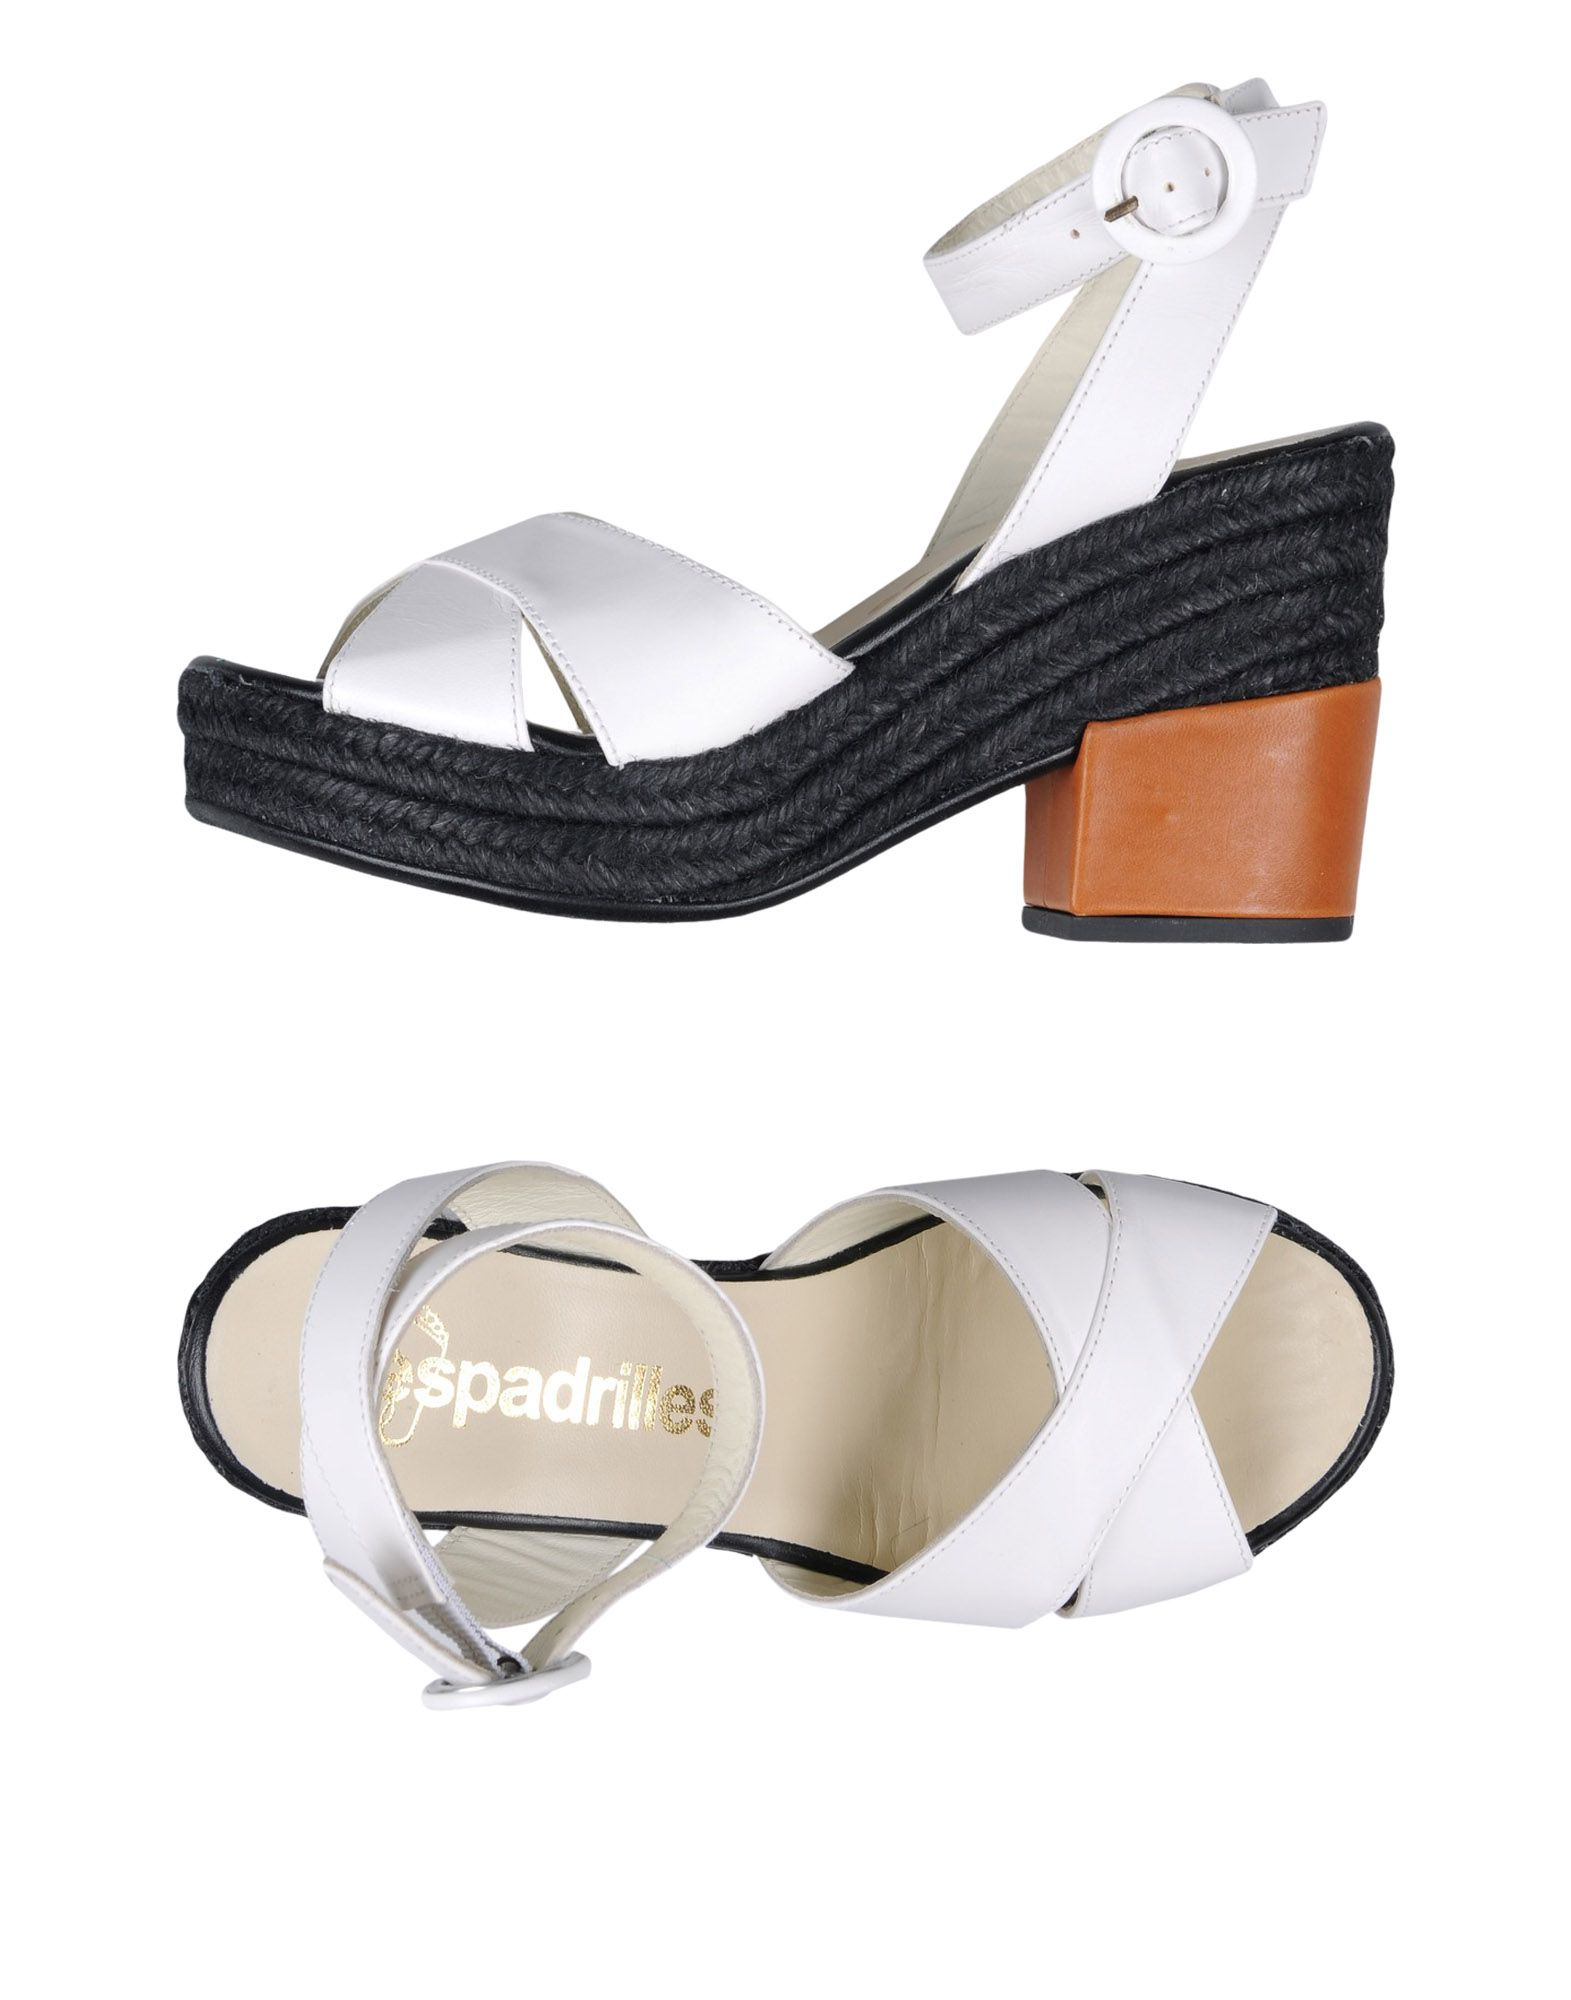 Espadrilles Sandalen Damen beliebte  11424930UT Gute Qualität beliebte Damen Schuhe 3ee169